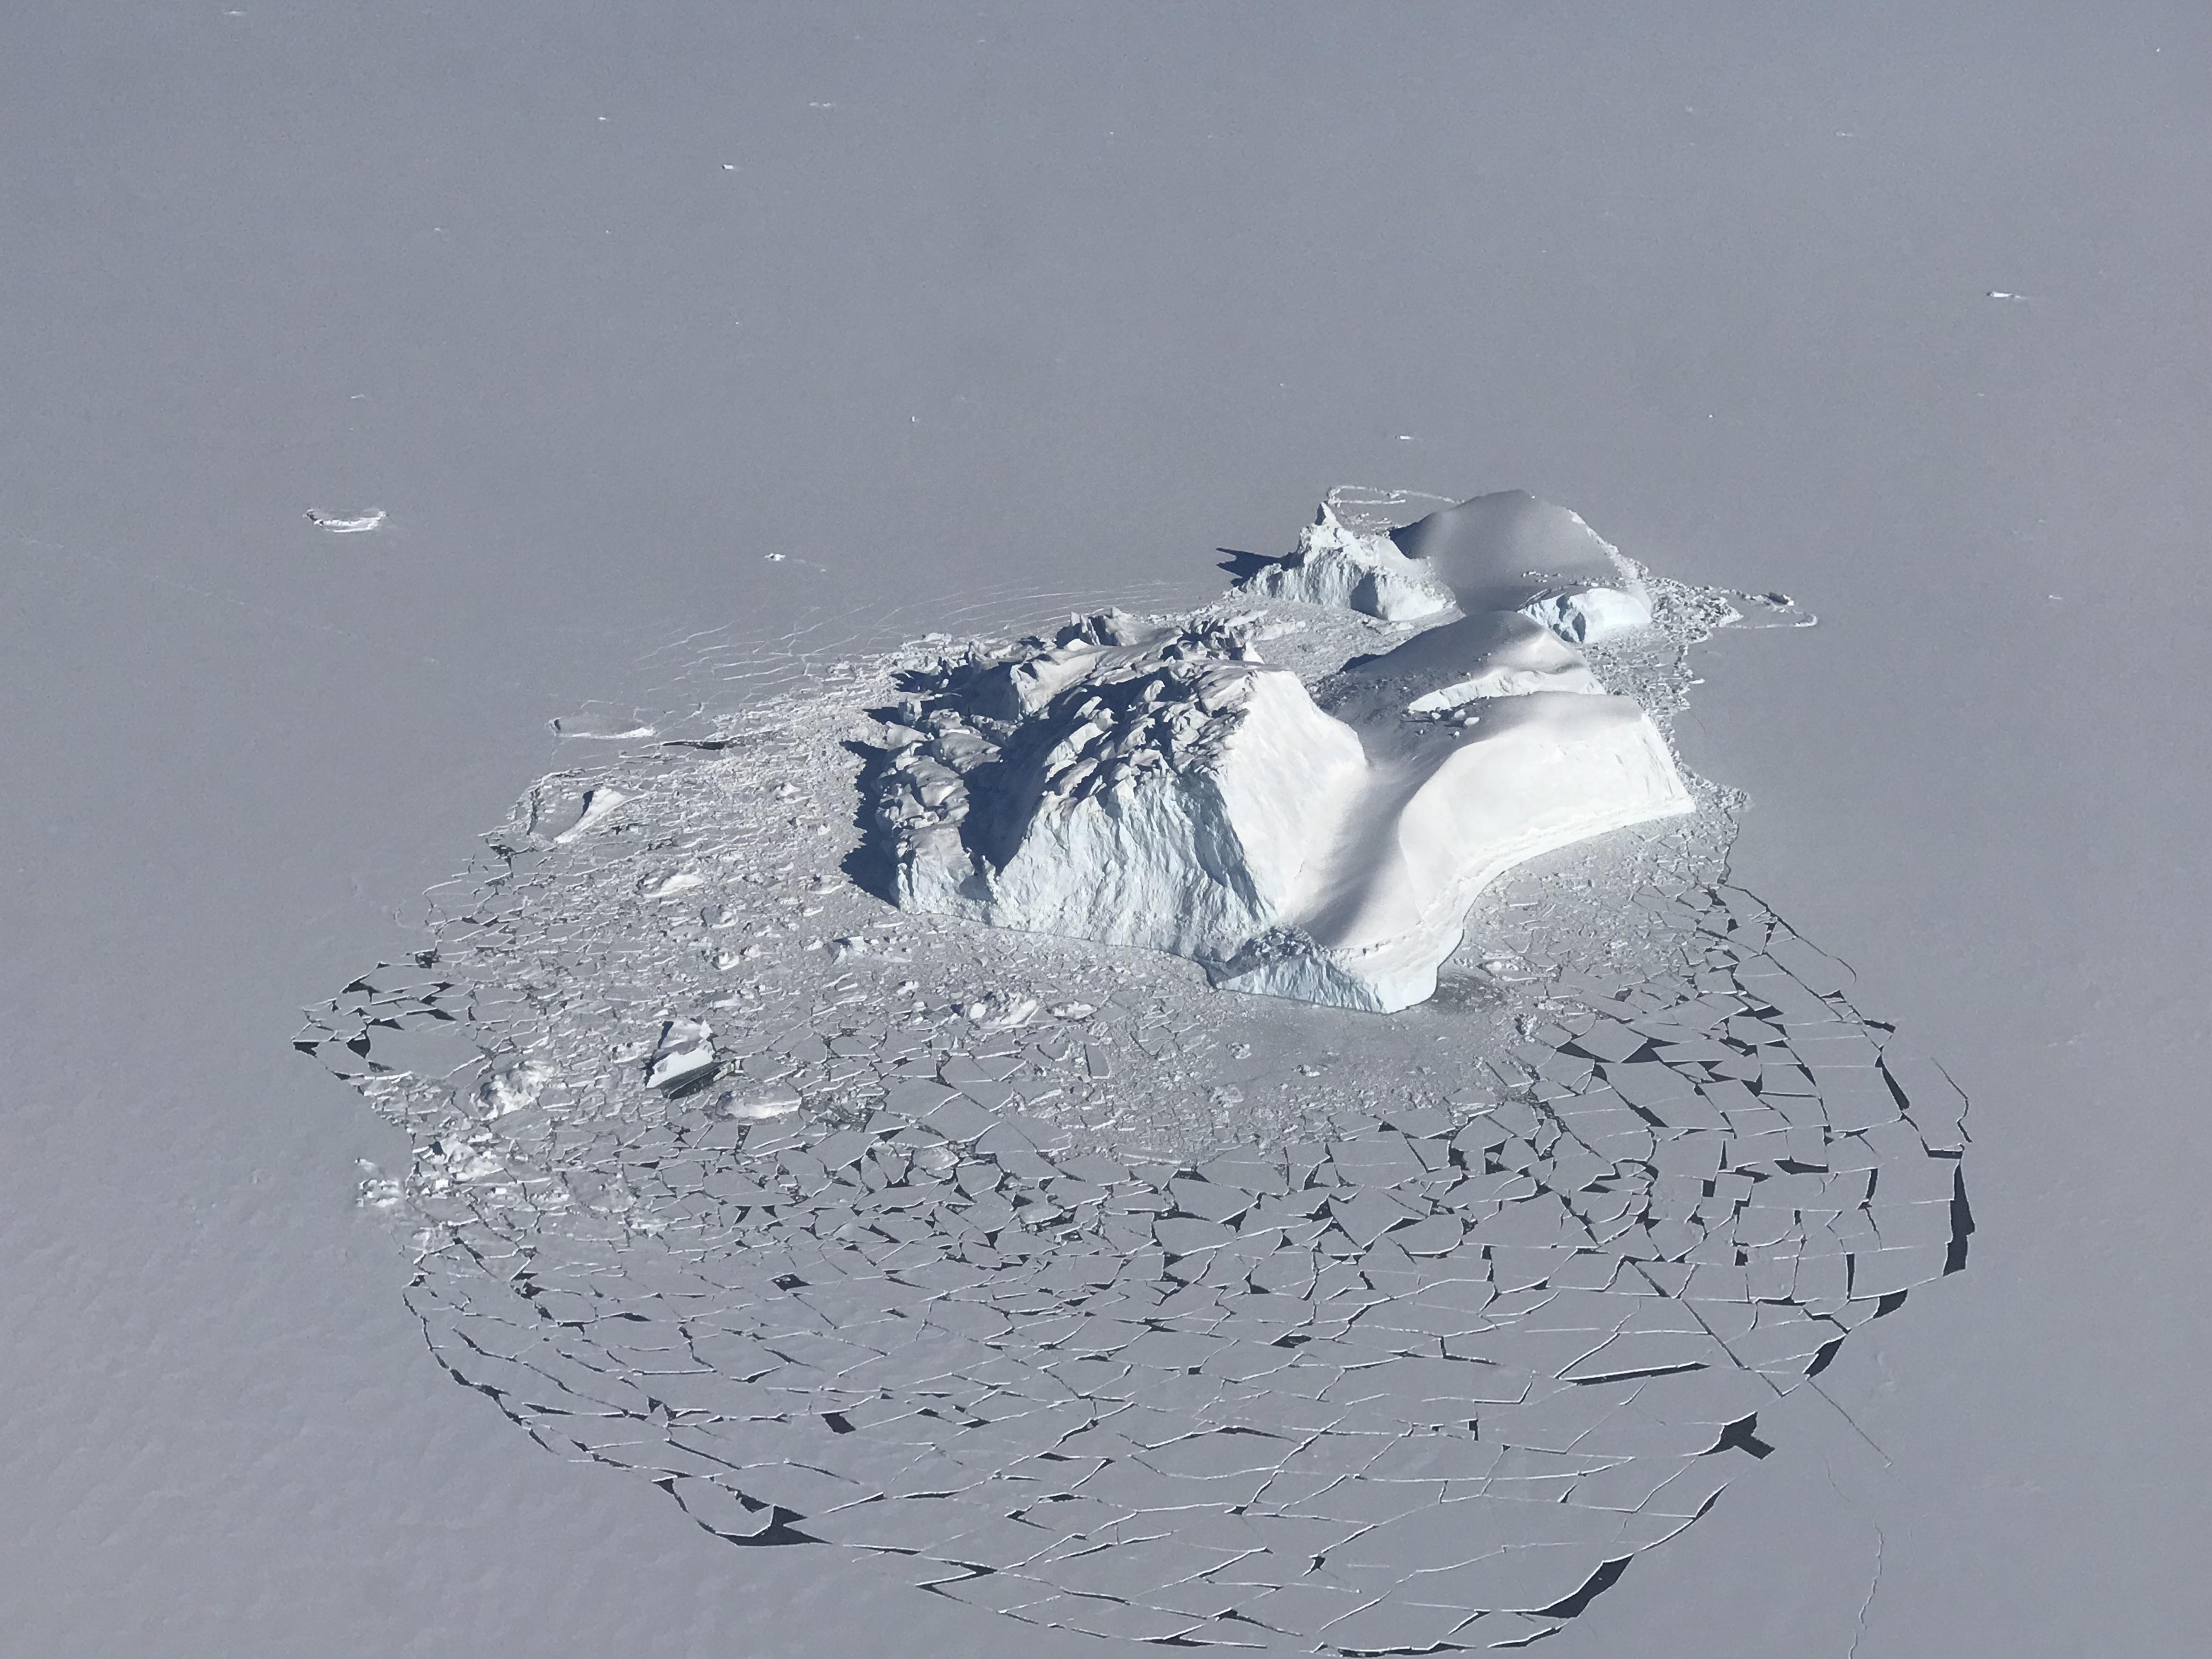 NASA Completes Survey Flights to Map Arctic Ice | NASA on ice staff, ice homeland security program, ice restaurant,